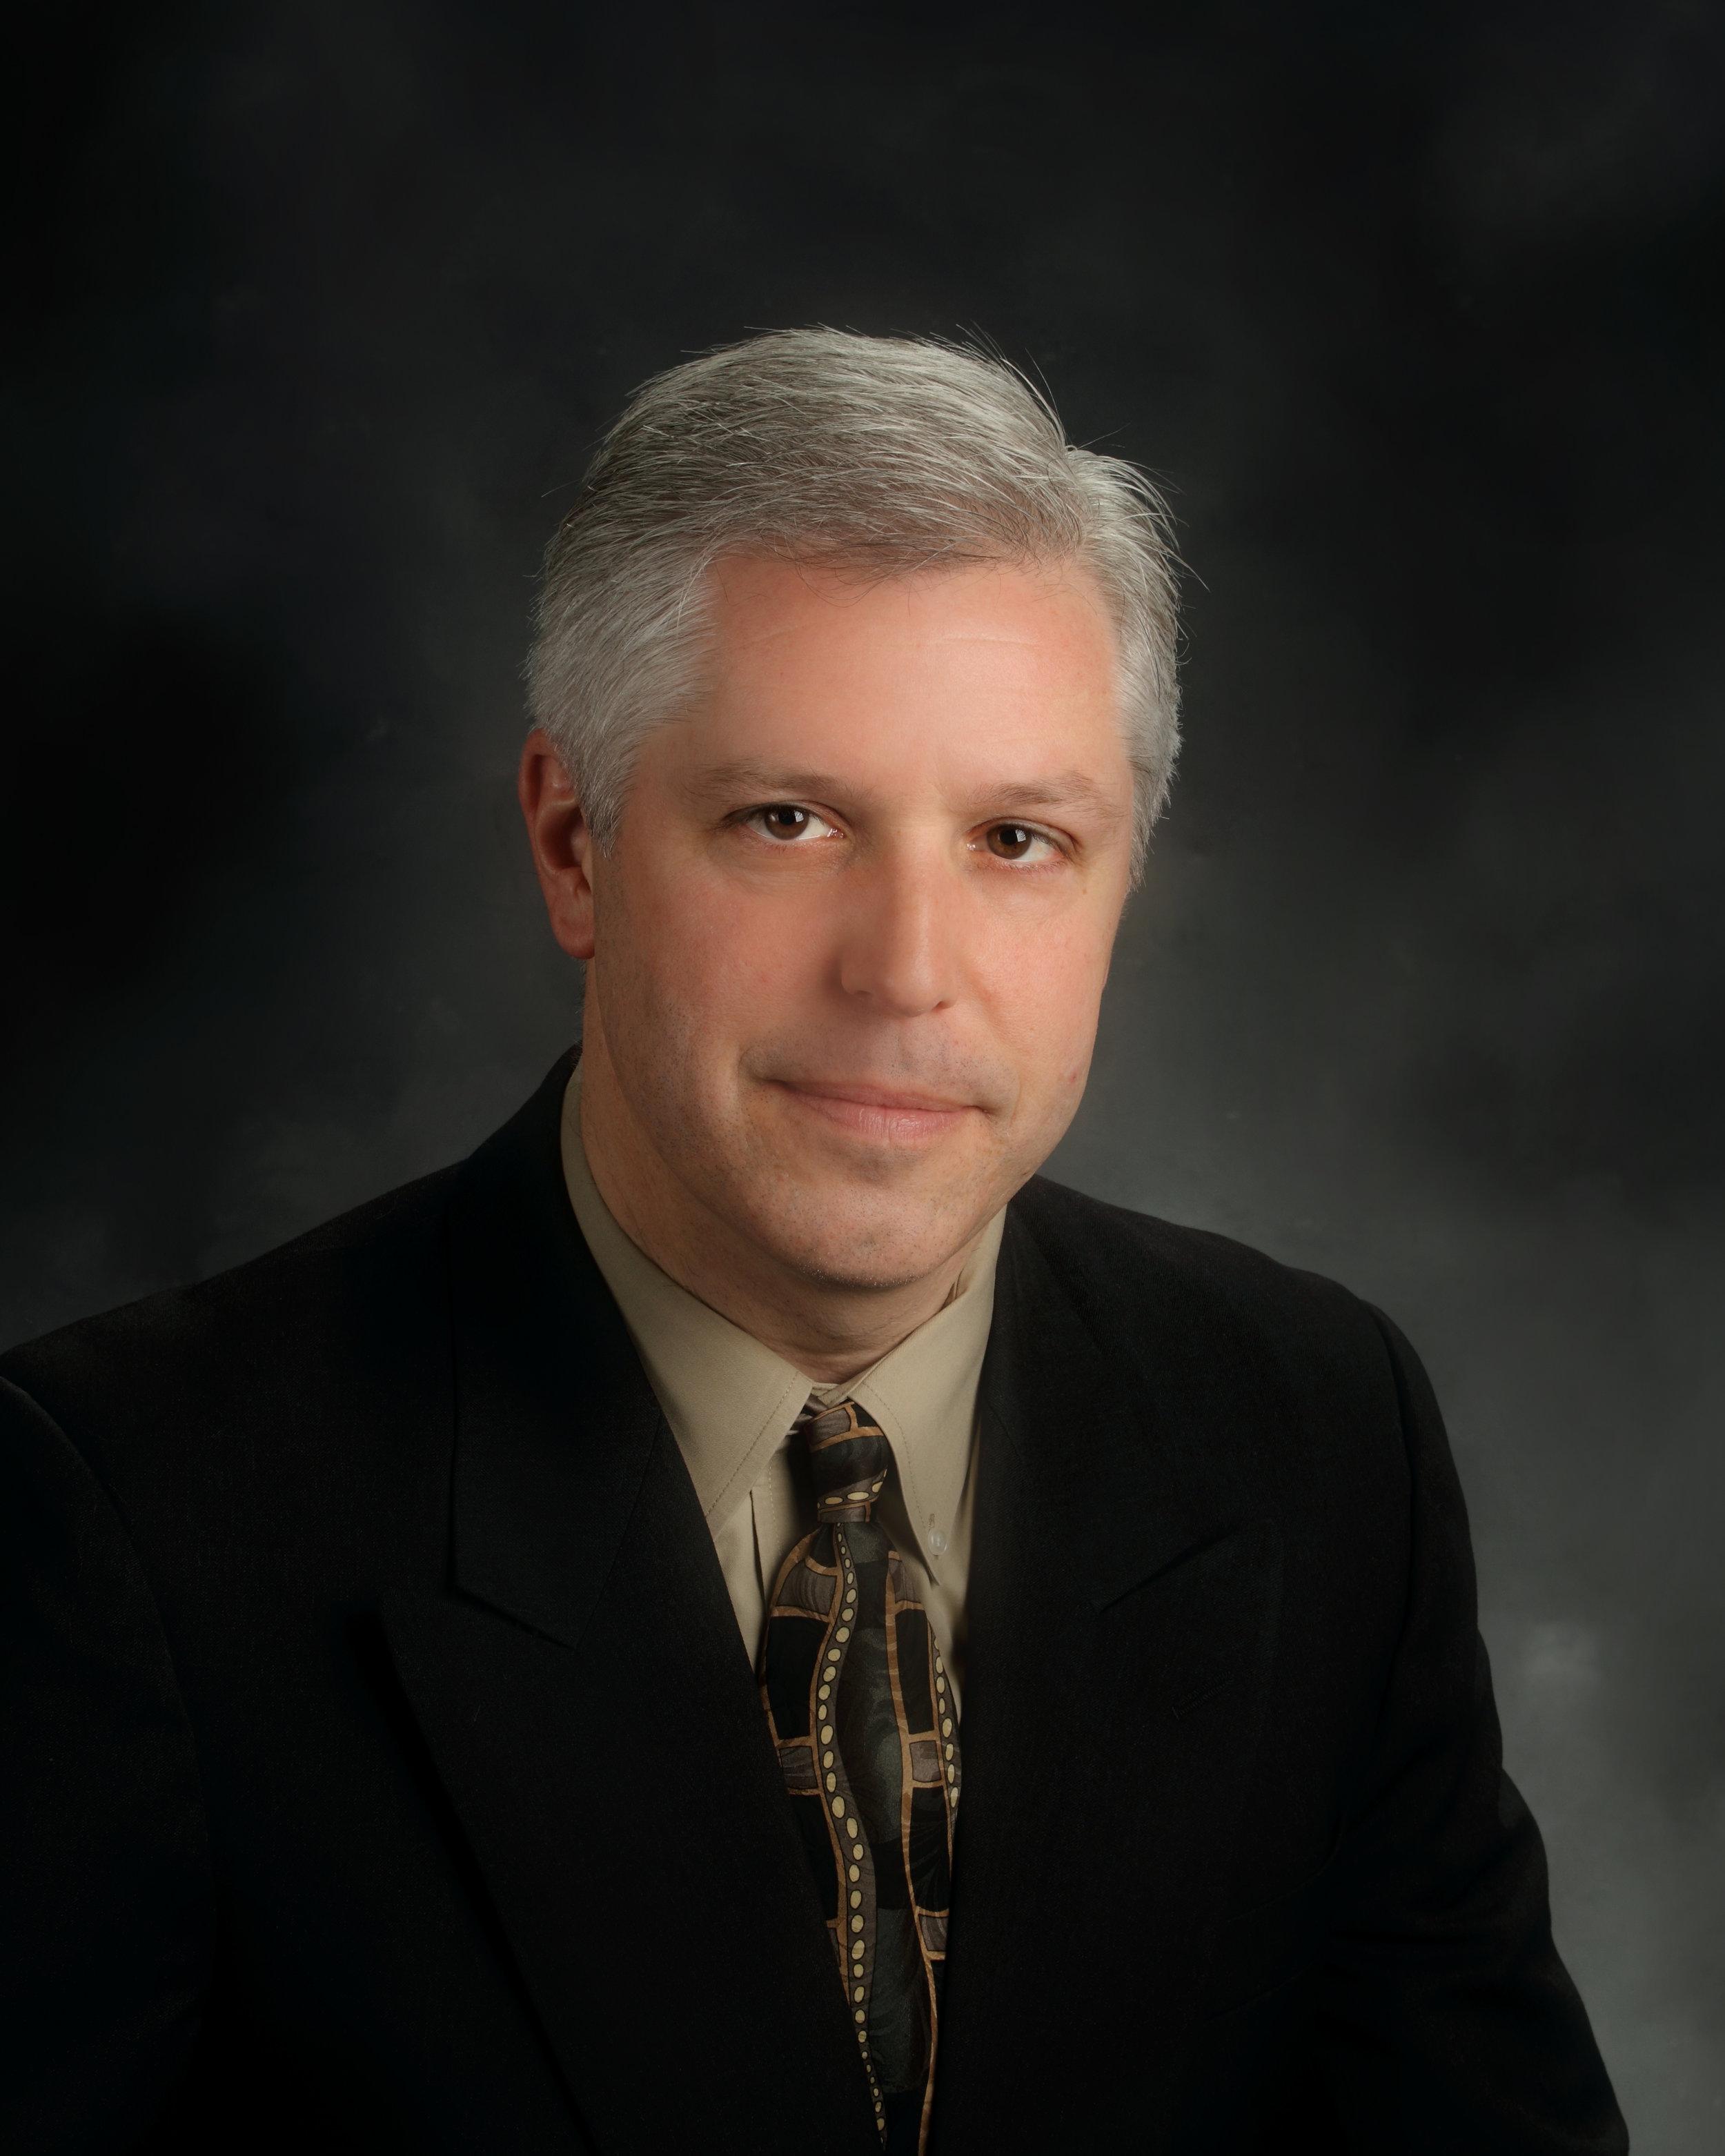 Michael Warner, Sr., INSYTE Consulting Group, LLC